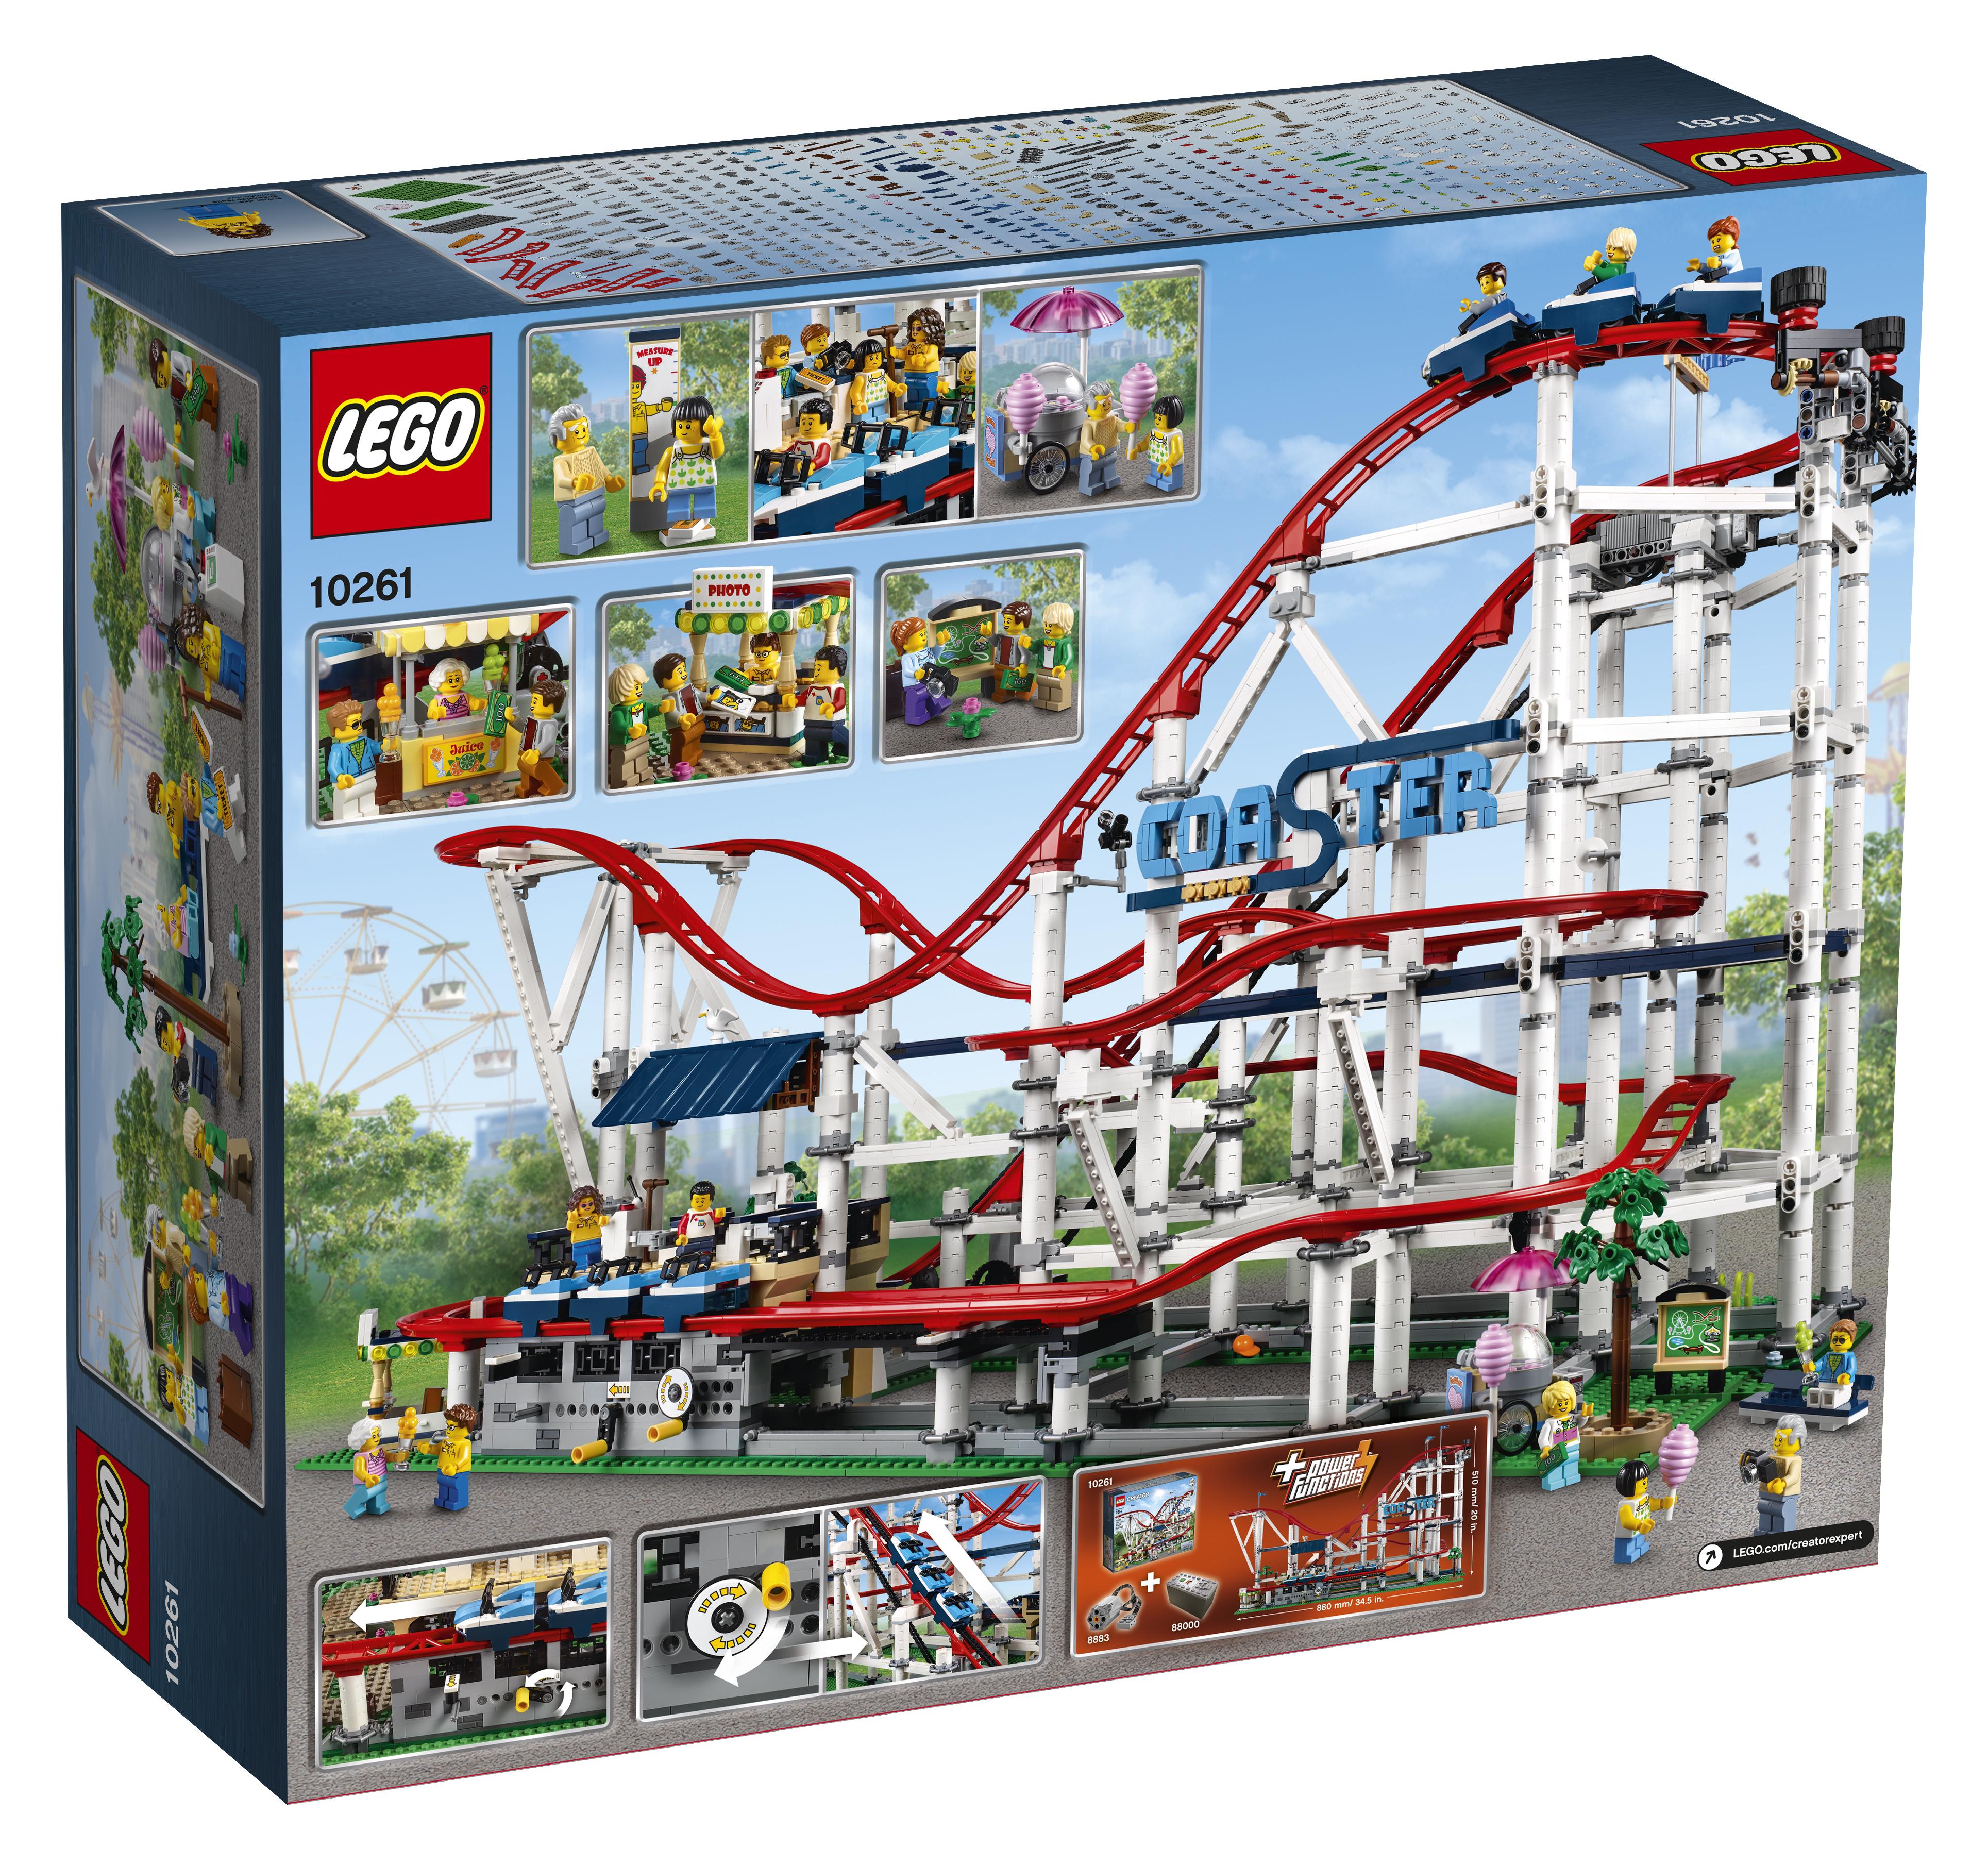 LEGO Creator Rutsjebane - 10261